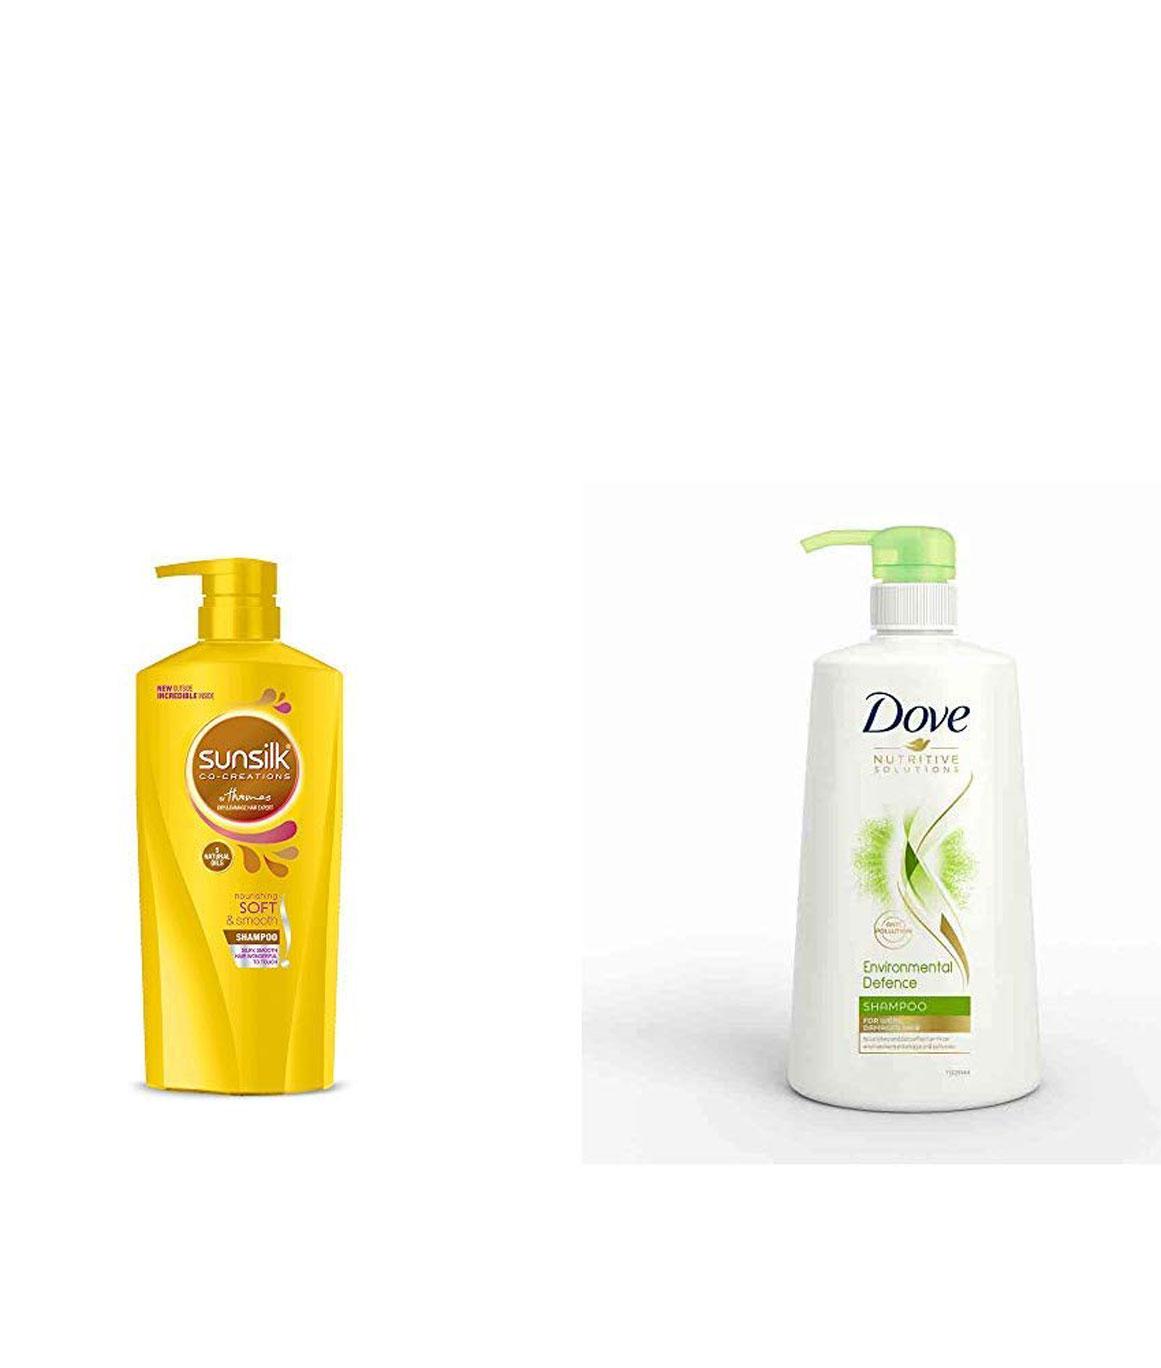 Sunsilk Nourishing Soft & Smooth Shampoo 650ml & Dove Environmental Defence Shampoo, 650ml